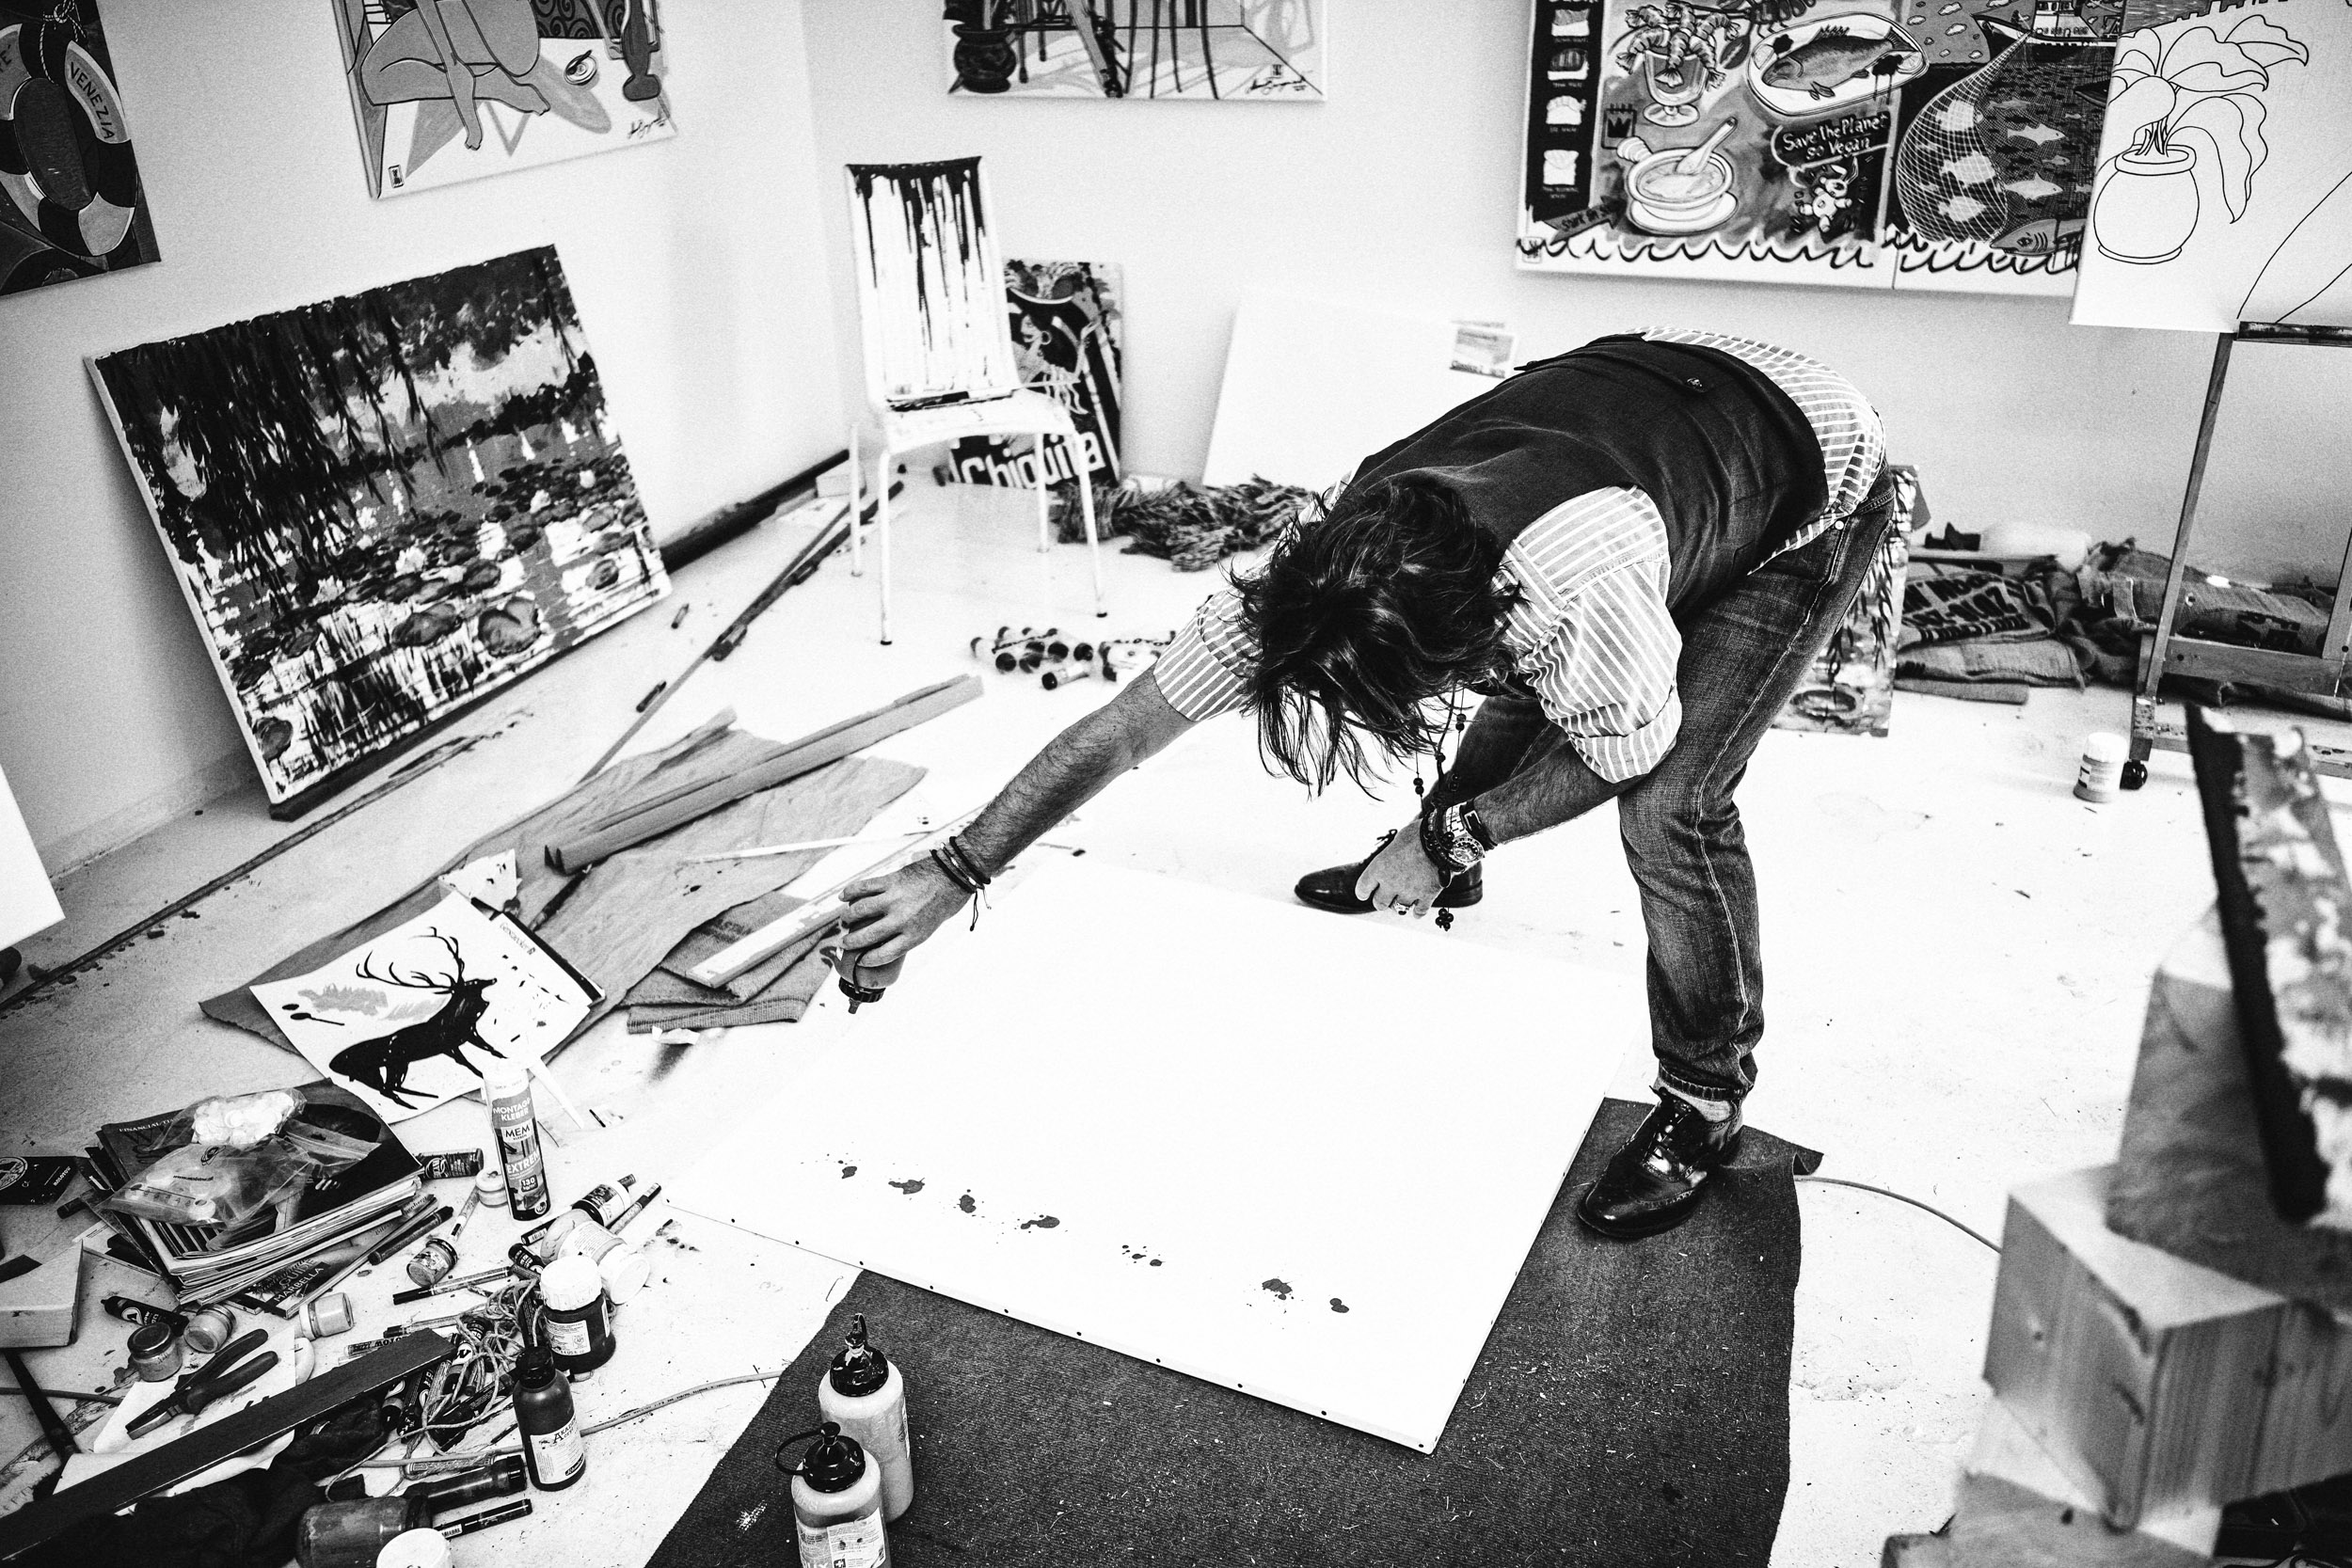 2018-SeifertUebler-Mauro-Bergonzoli-lifestyle-portrait-artist-photography-009.jpg